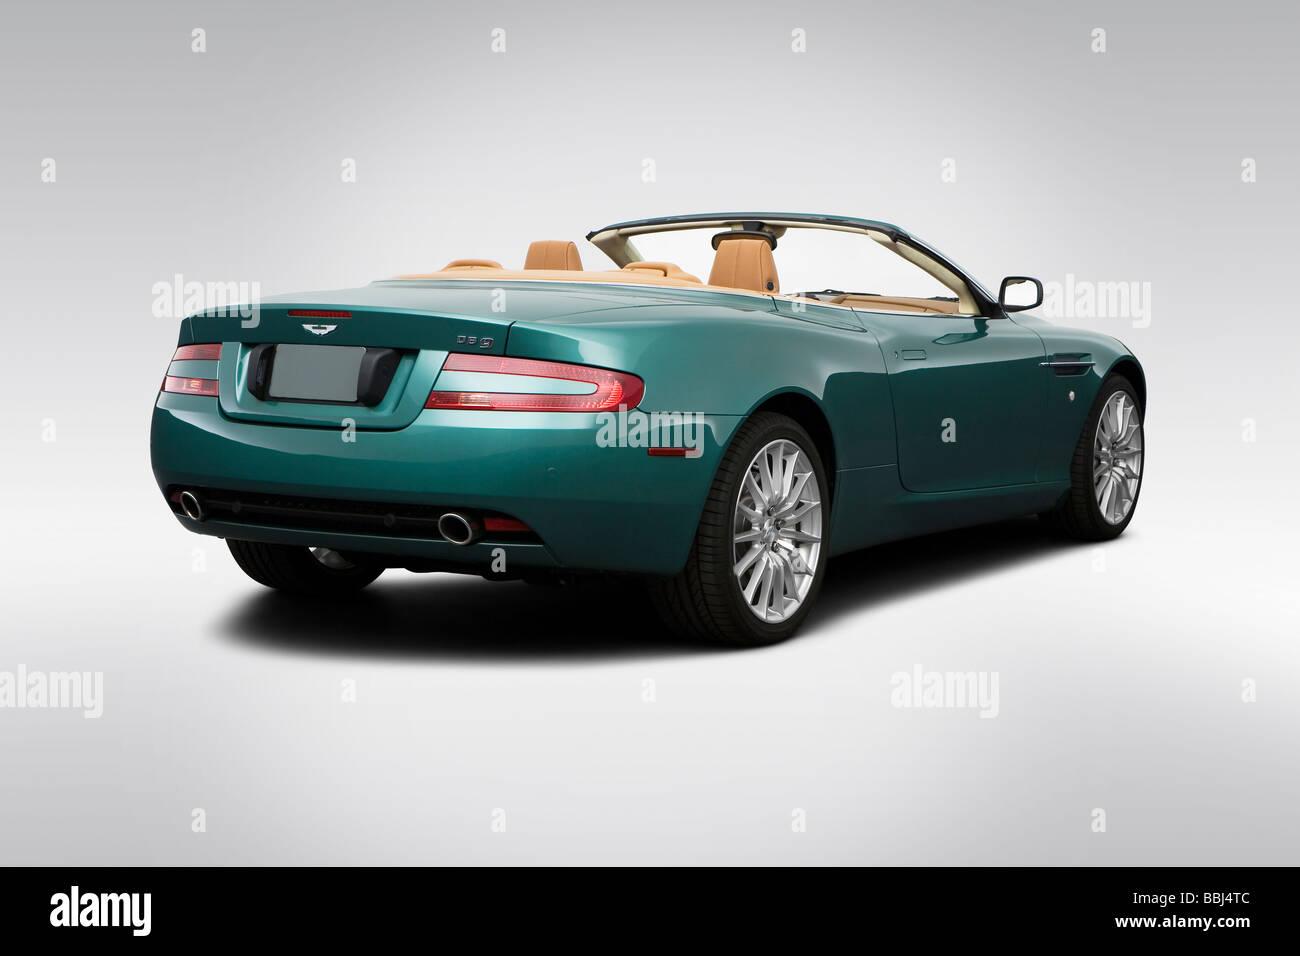 2009 Aston Martin Db9 Volante In Green Rear Angle View Stock Photo Alamy